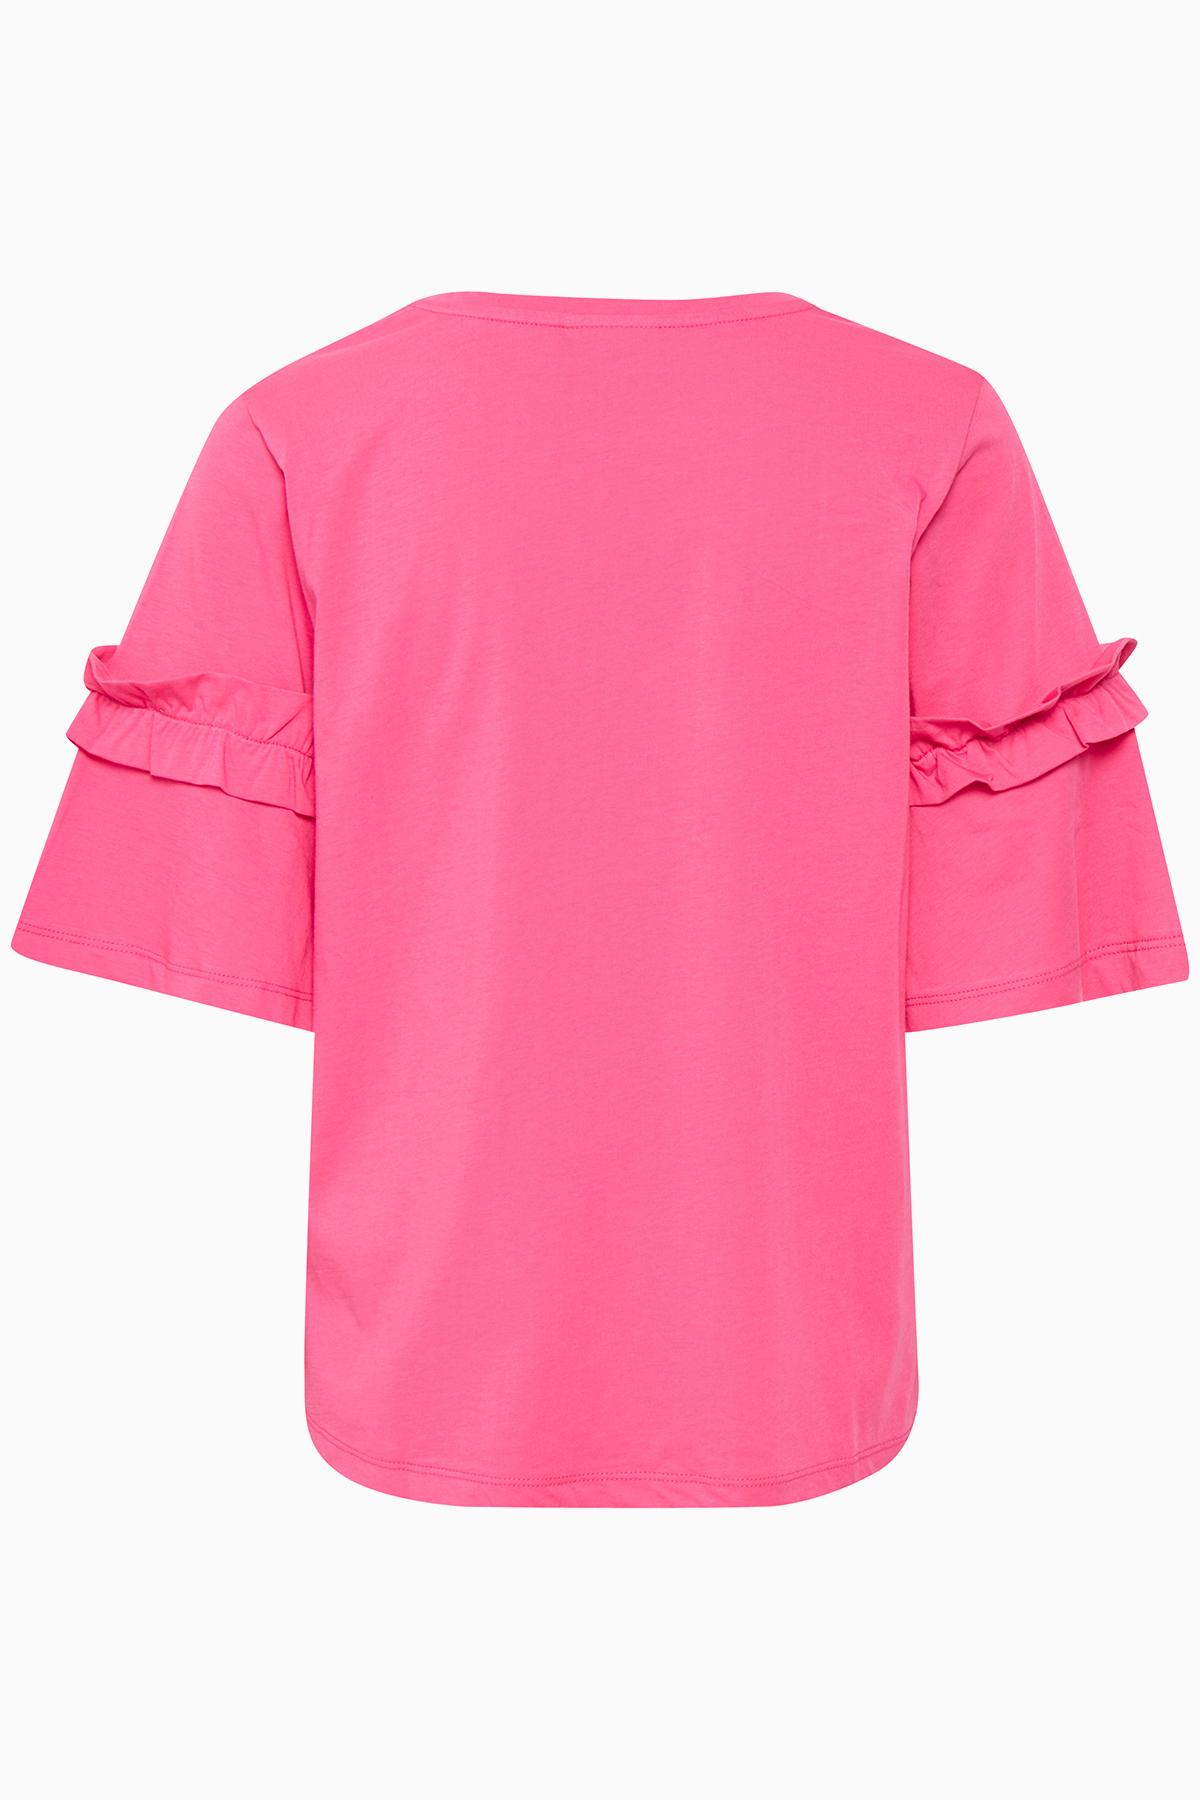 Fuchsia Kortærmet T-shirt fra Kaffe – Køb Fuchsia Kortærmet T-shirt fra str. XS-XXL her